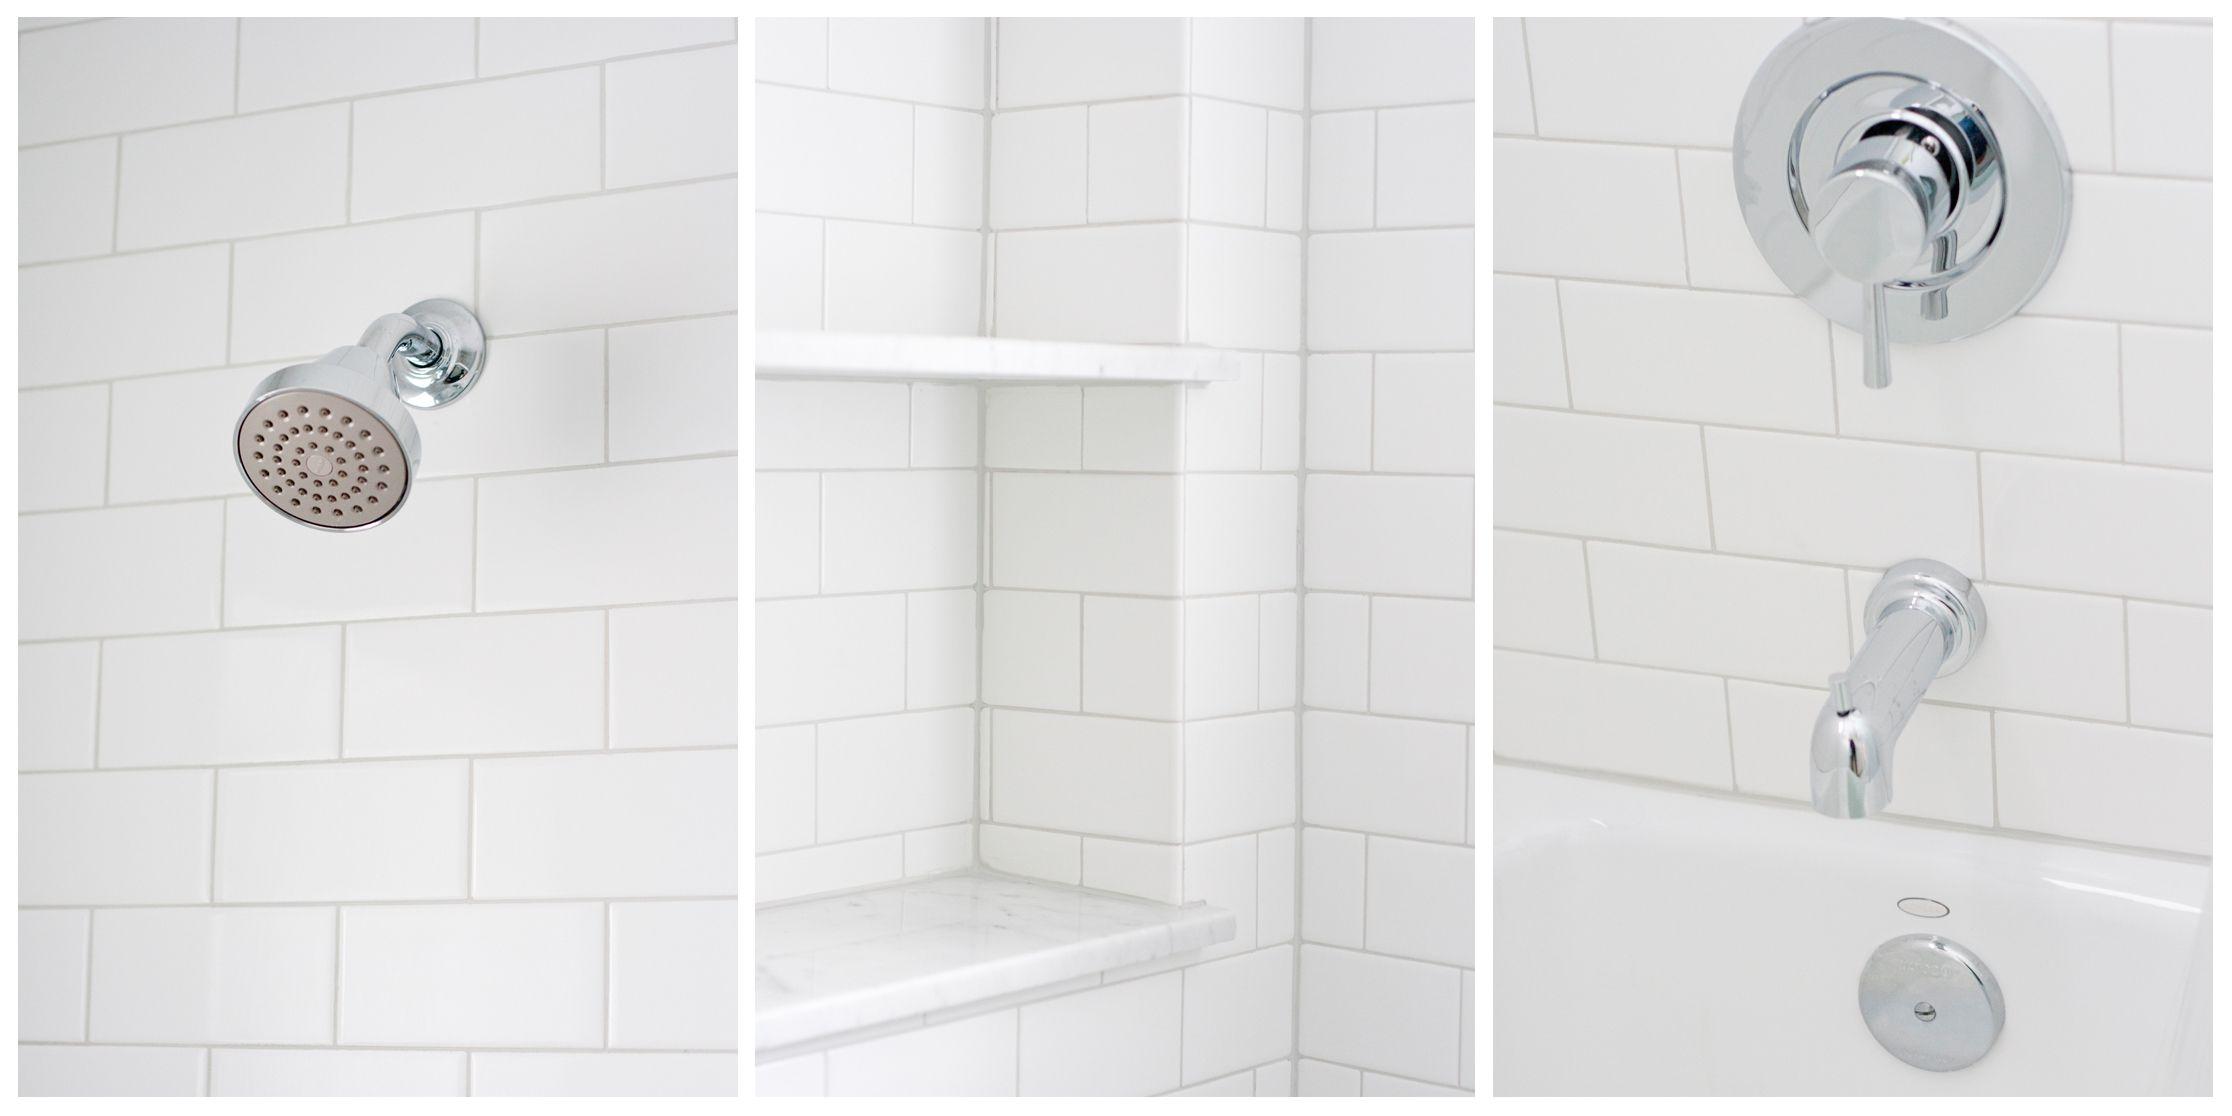 Bountiful Bathroom | Tiek Built Homes | my houses | Pinterest ...